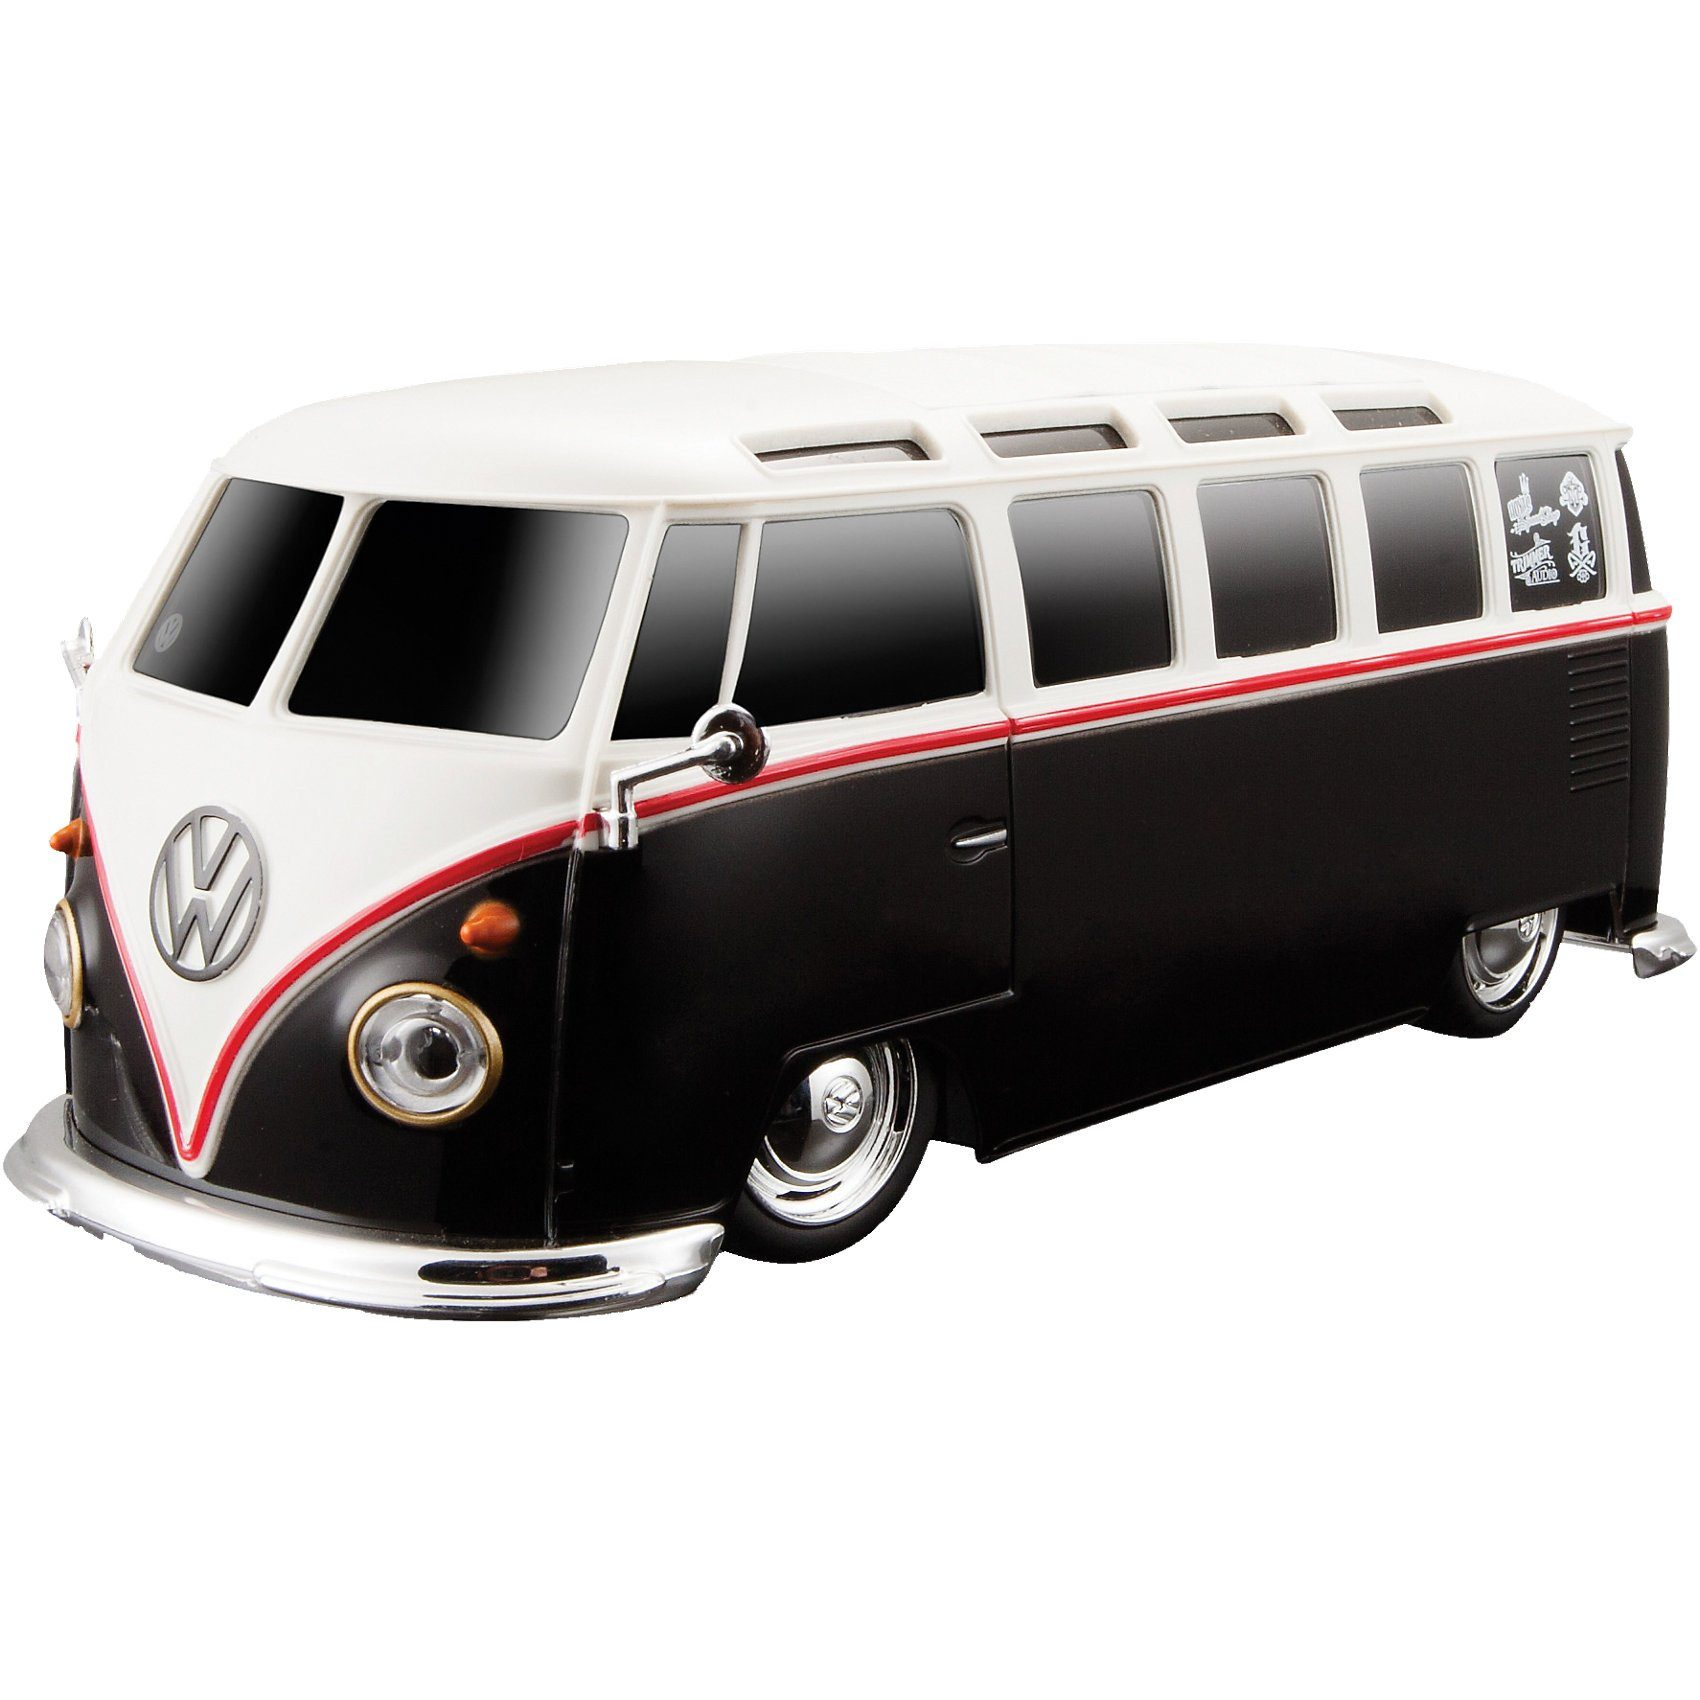 Maisto RC Fahrzeug VW Bus Samba 1:24